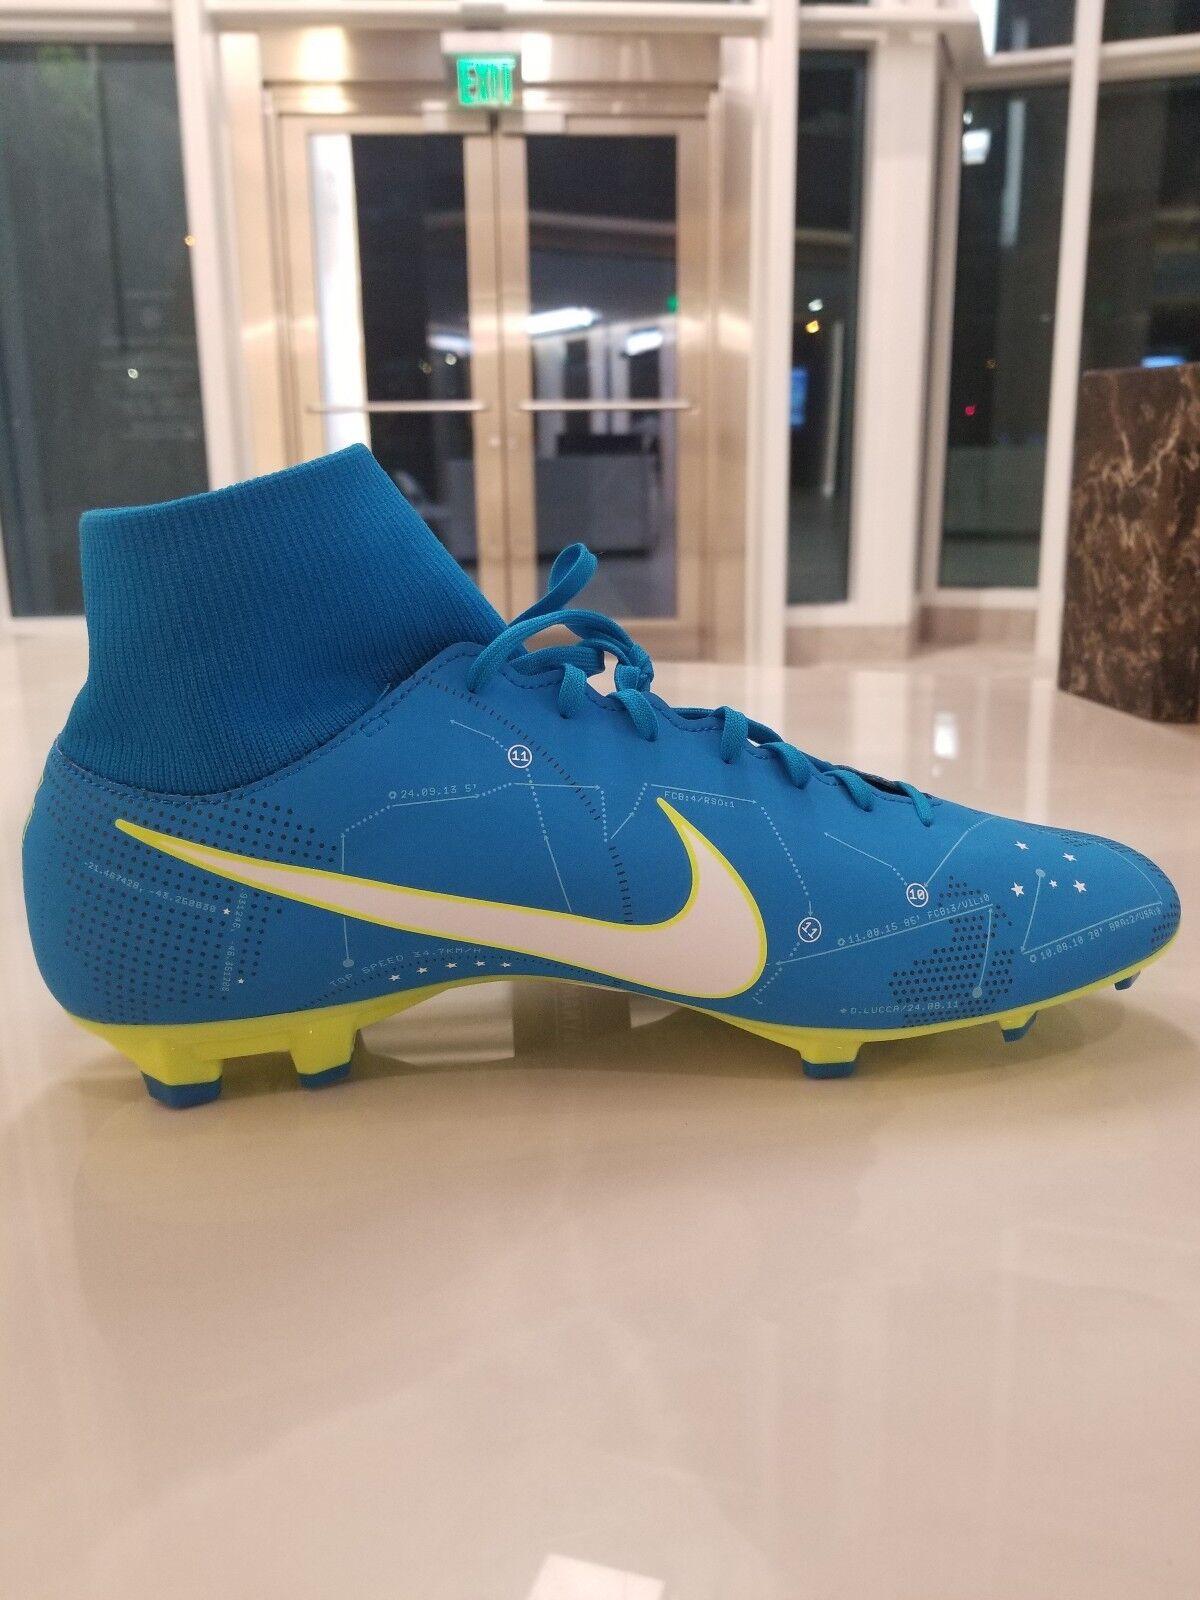 Nike Mercurial Victory VI VI Victory 6 DF NJR FG Neymar JR Soccer Cleats SZ 12 (921506-400) d909bc